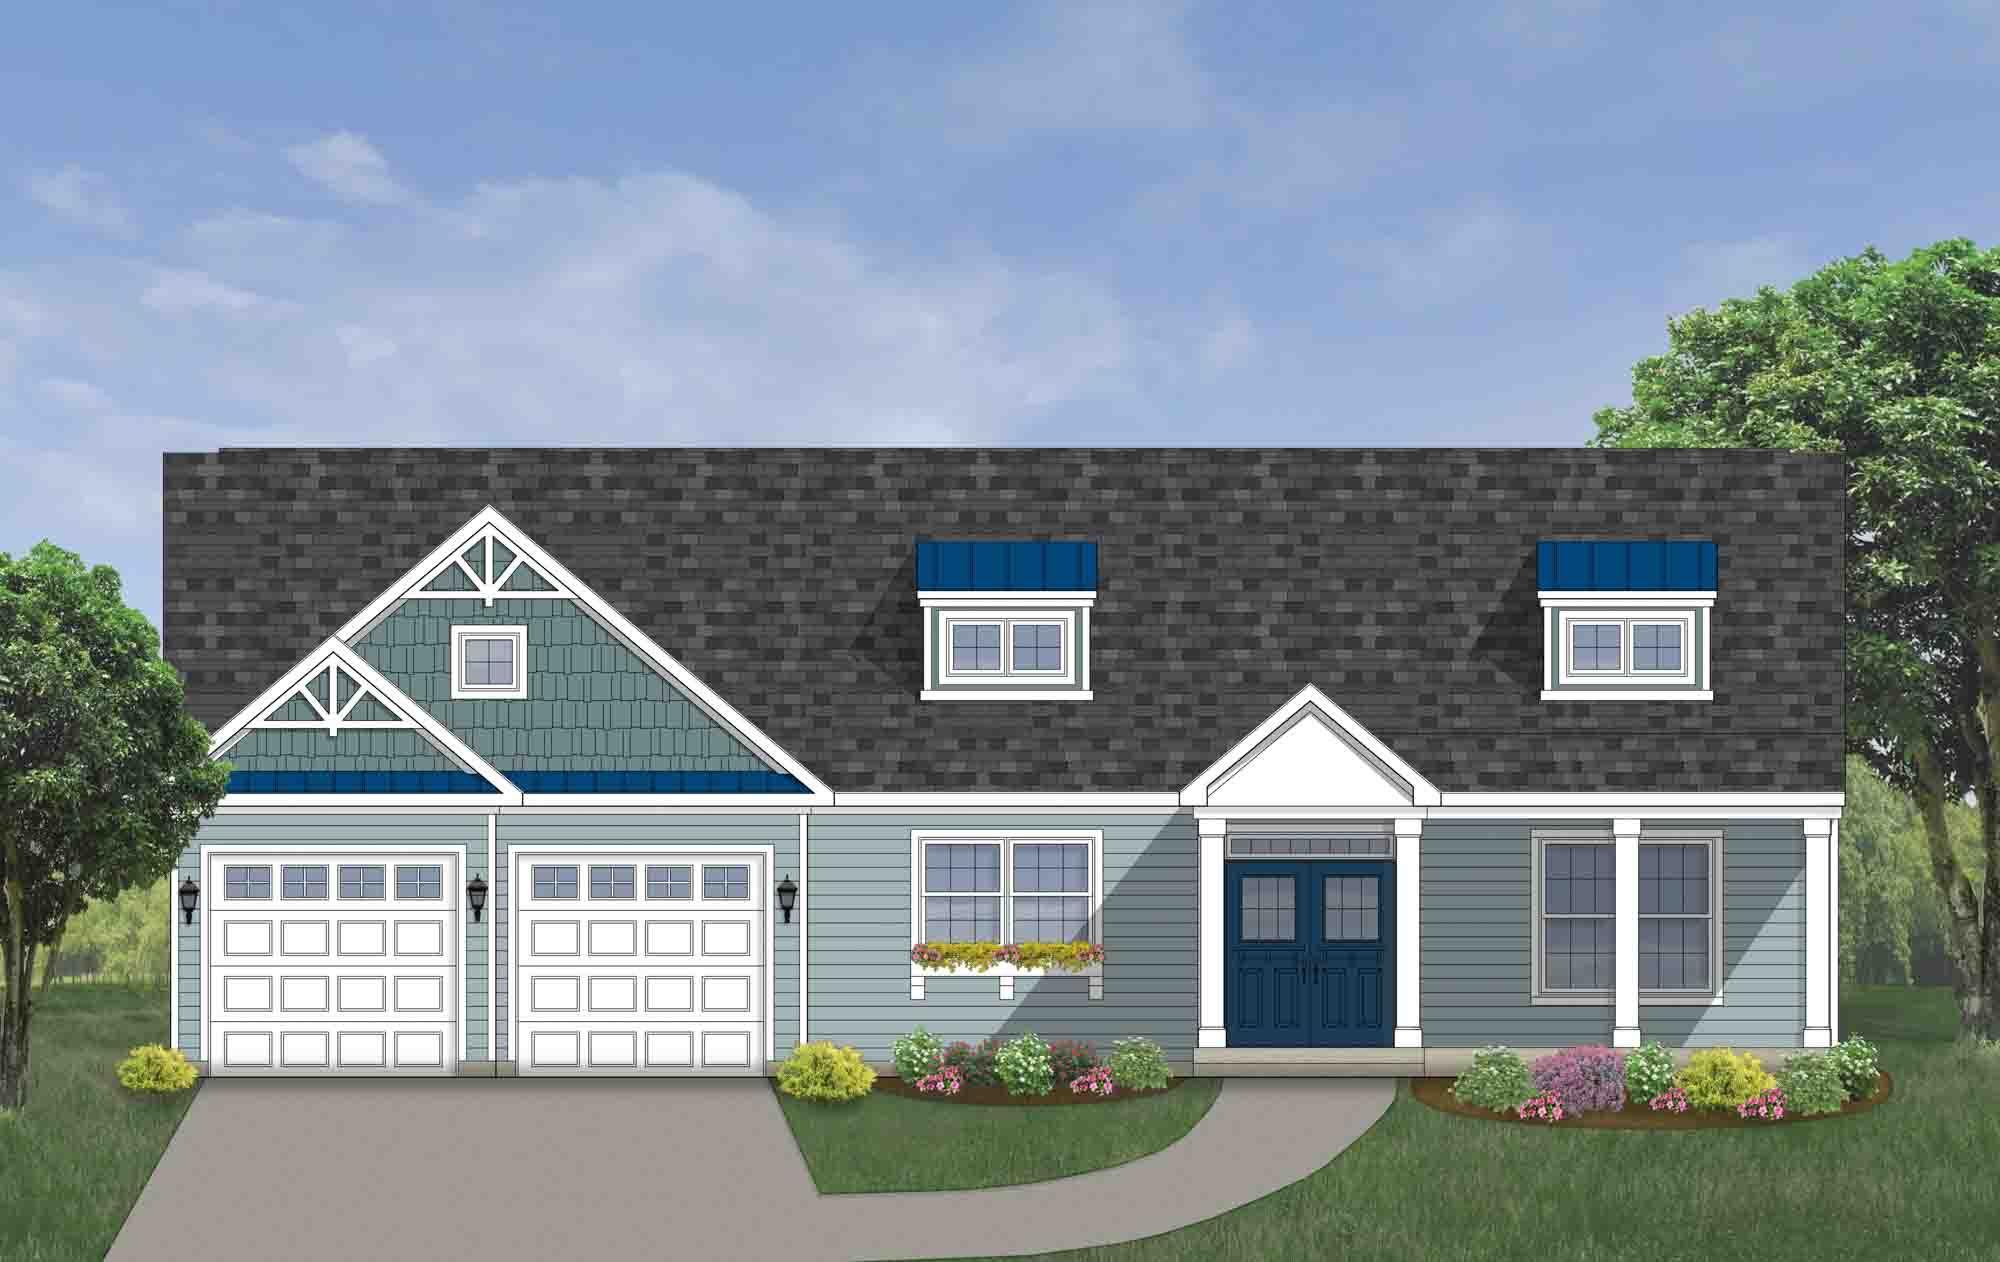 noble 39 s pond noble 39 s pond the regal 1318139 dover de new home for sale homegain